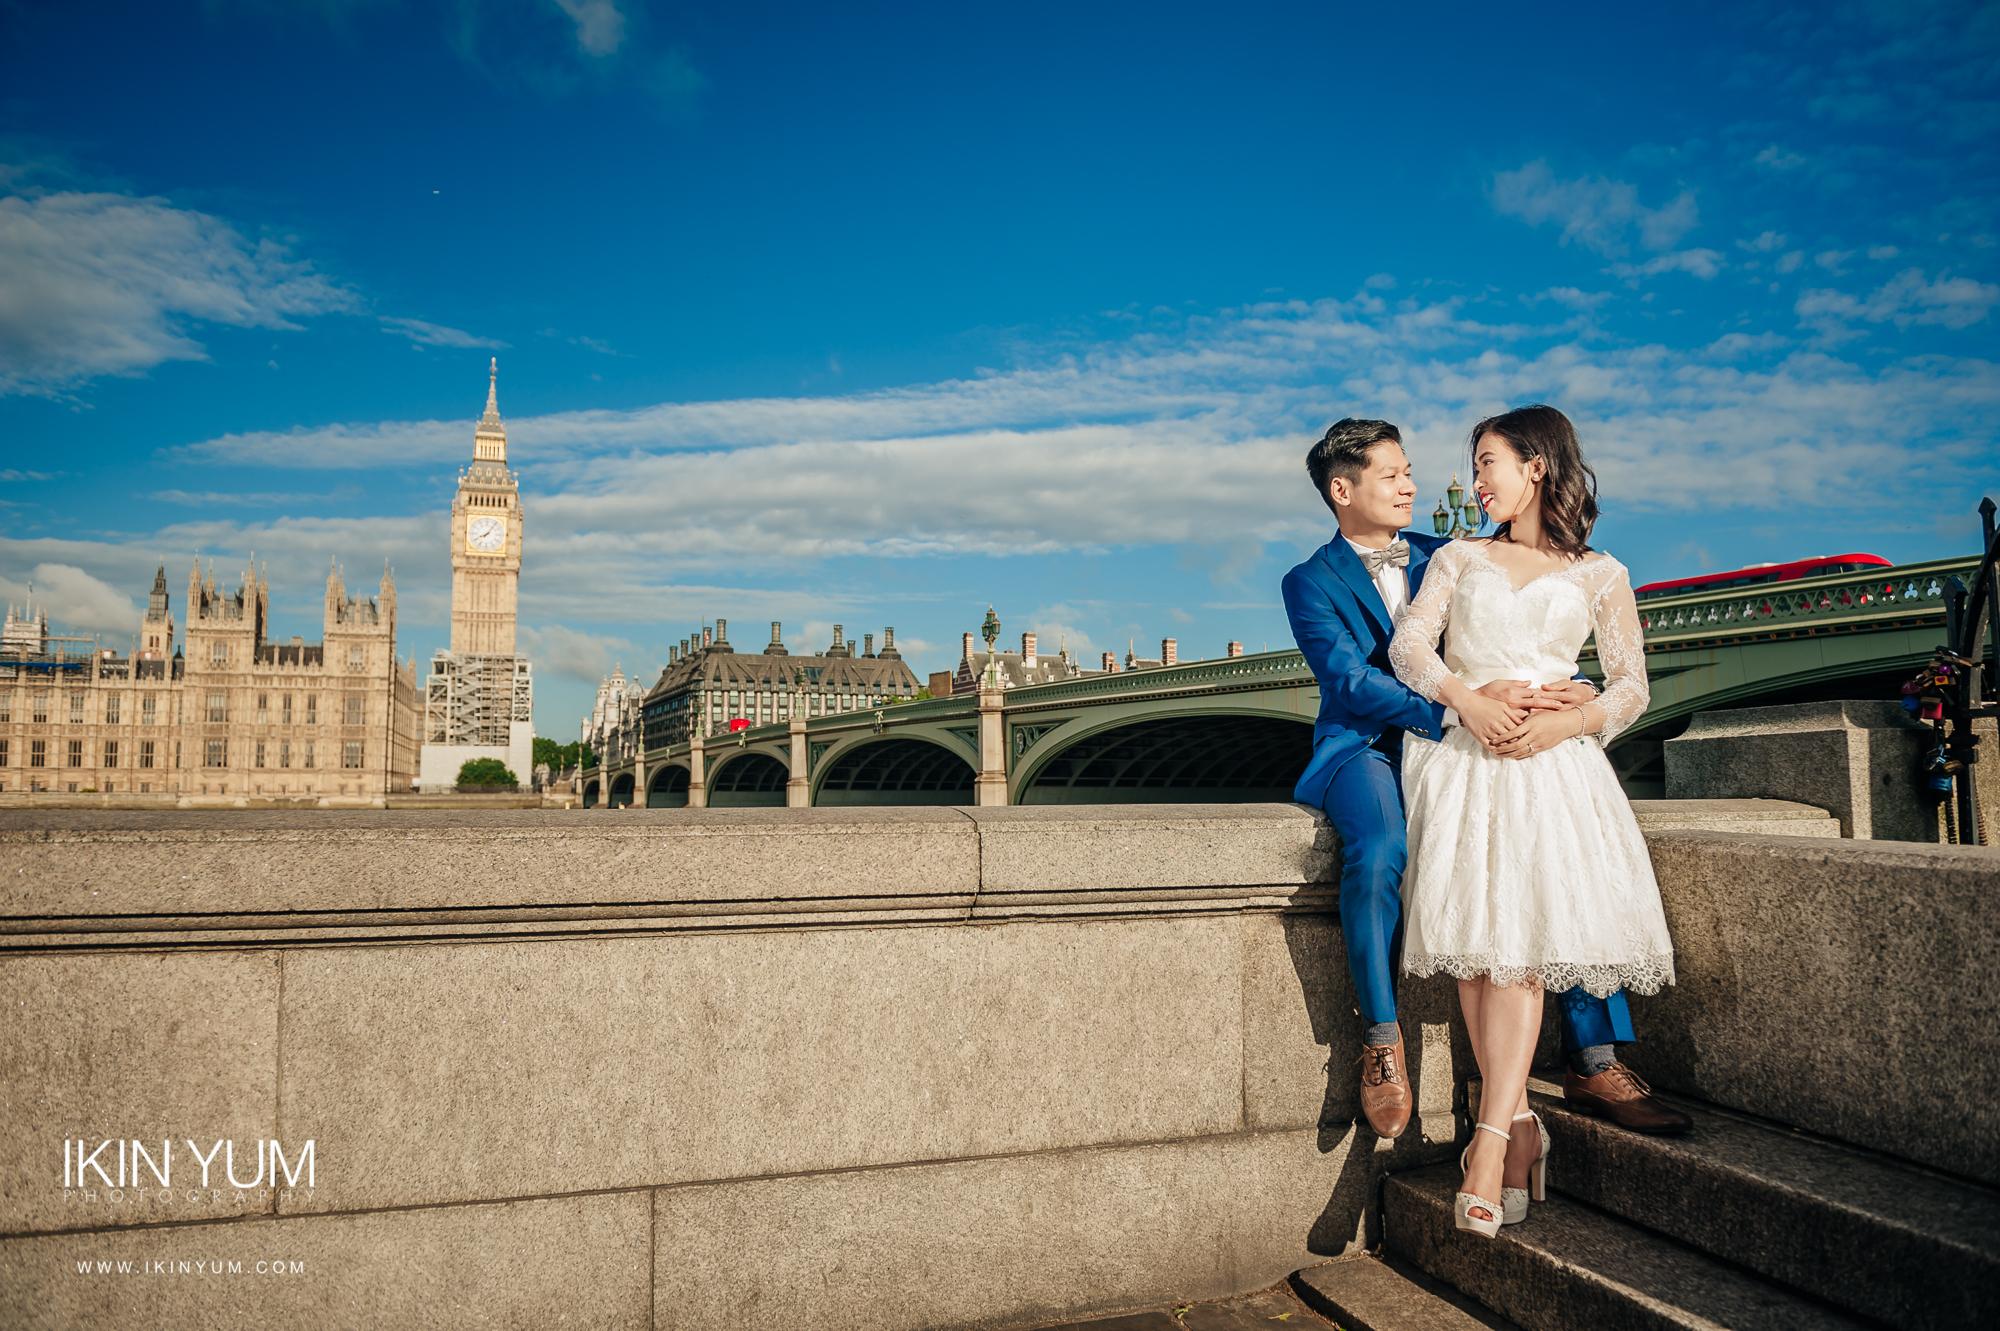 Natalie & Duncan Wedding Day - Ikin Yum Photography-010.jpg